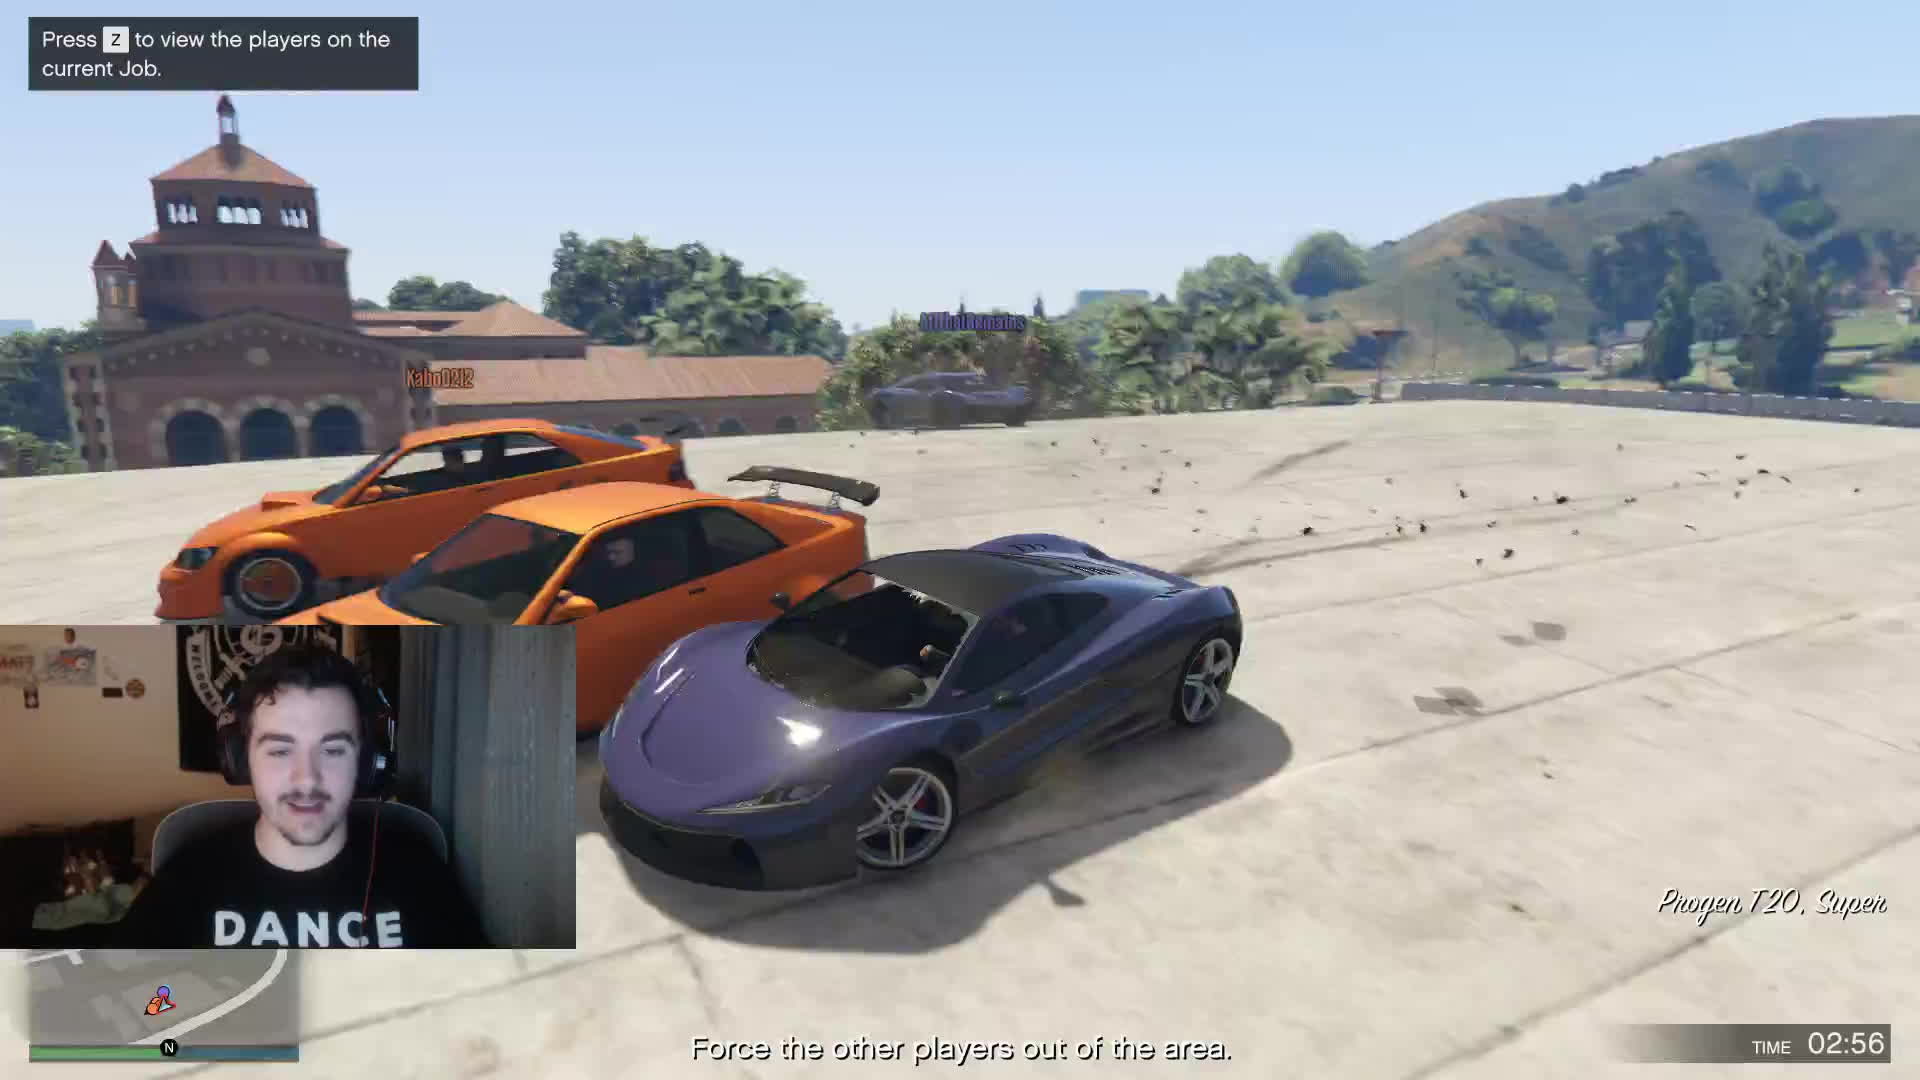 gta5, livestreamfails, Drunk GTA V Sumo Fail GIFs